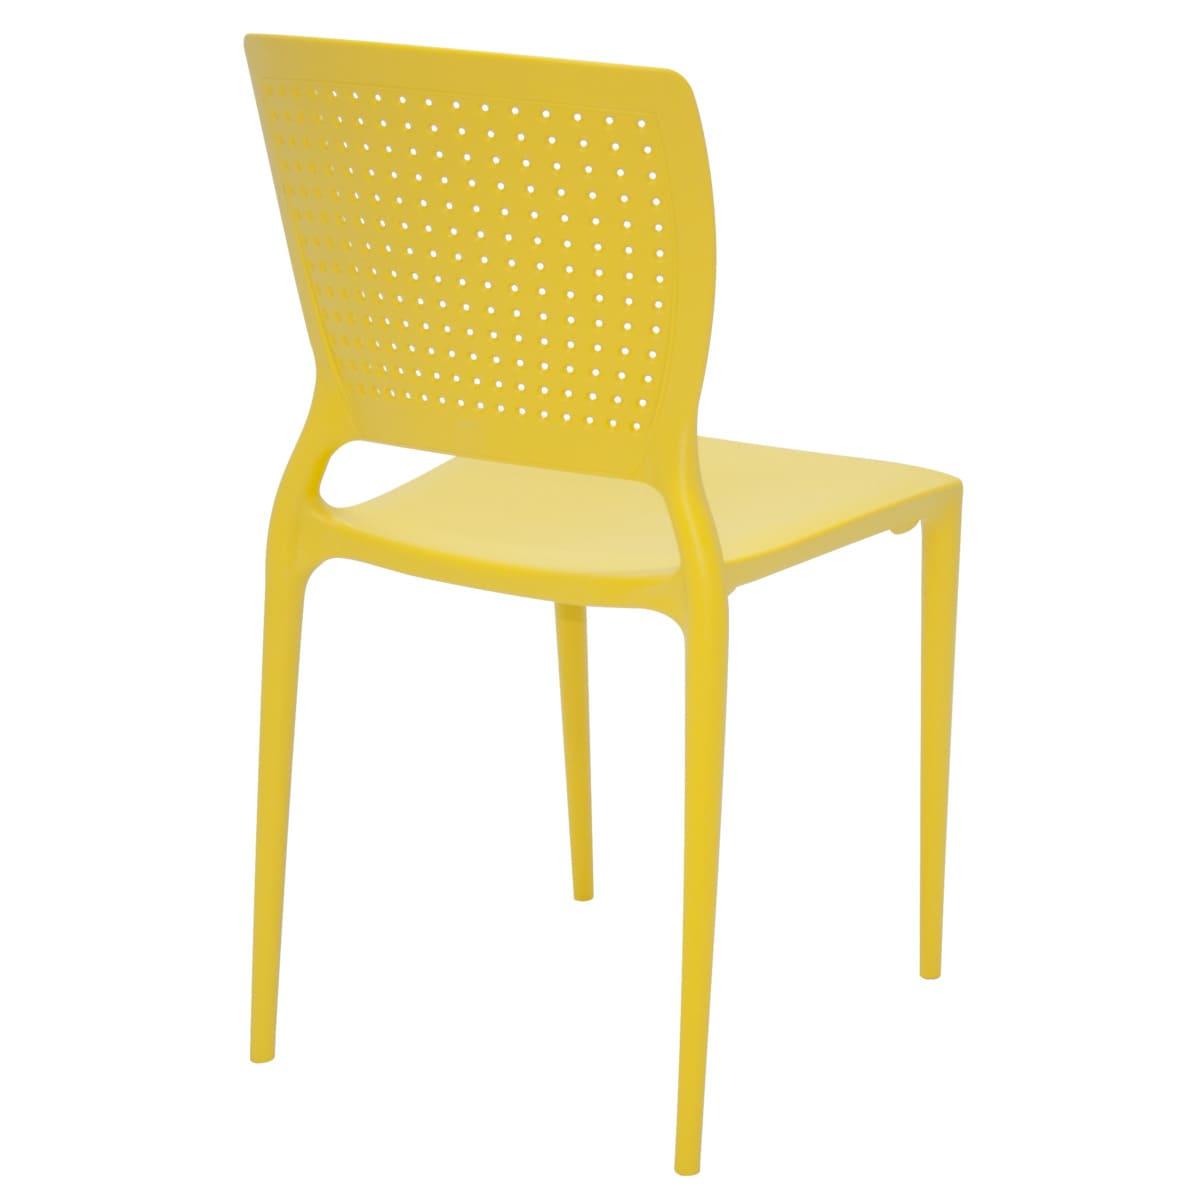 Cadeira Tramontina Safira Summa Amarelo 92048/000 1 Peça  - Casa Mattos